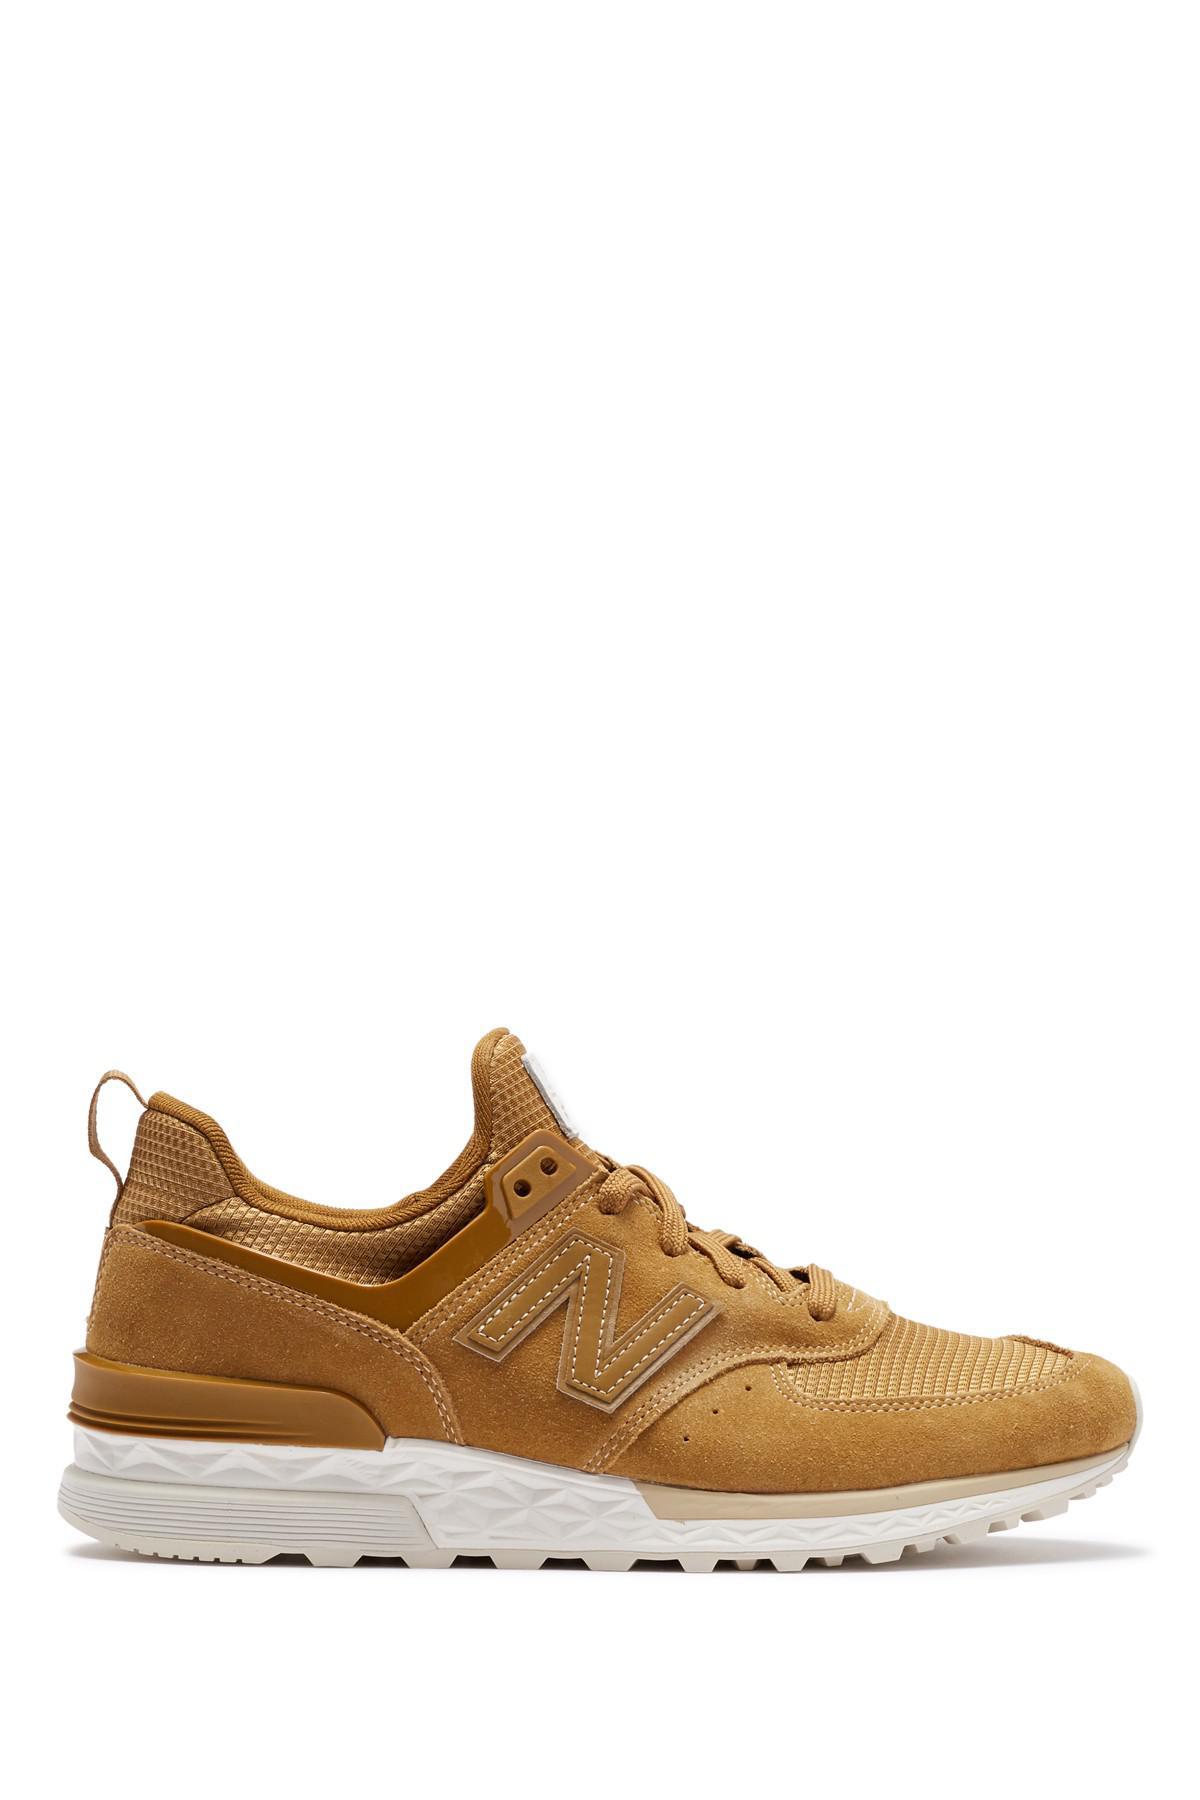 New Balance 574 Sport Suede Sneaker in Brown for Men - Lyst